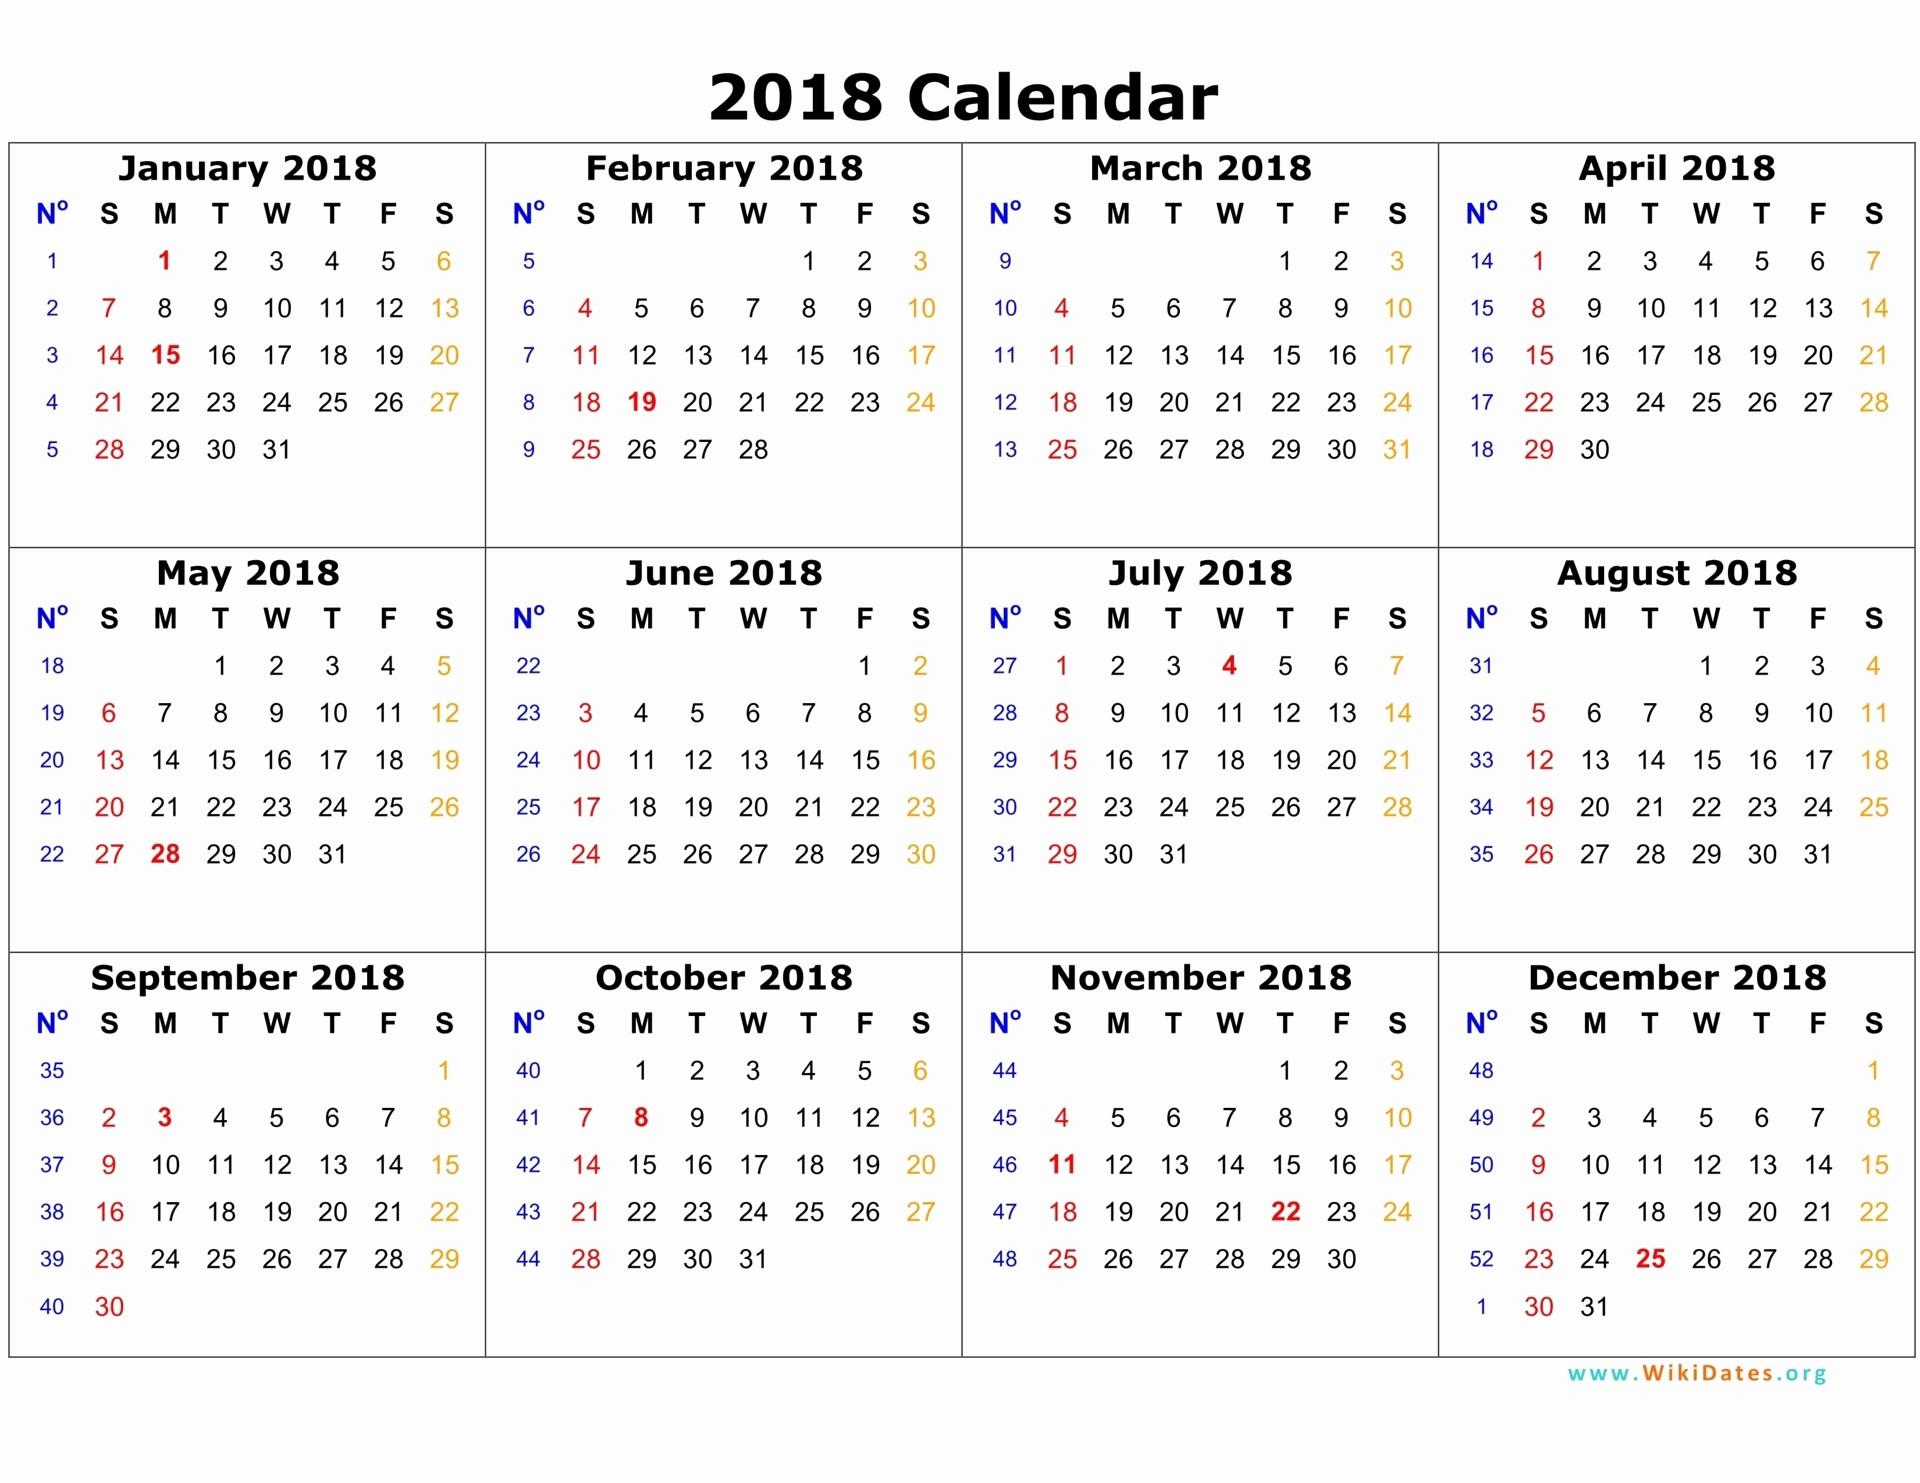 Calendar 2018 Printable with Holidays New 2018 Calendar Printable with Holidays